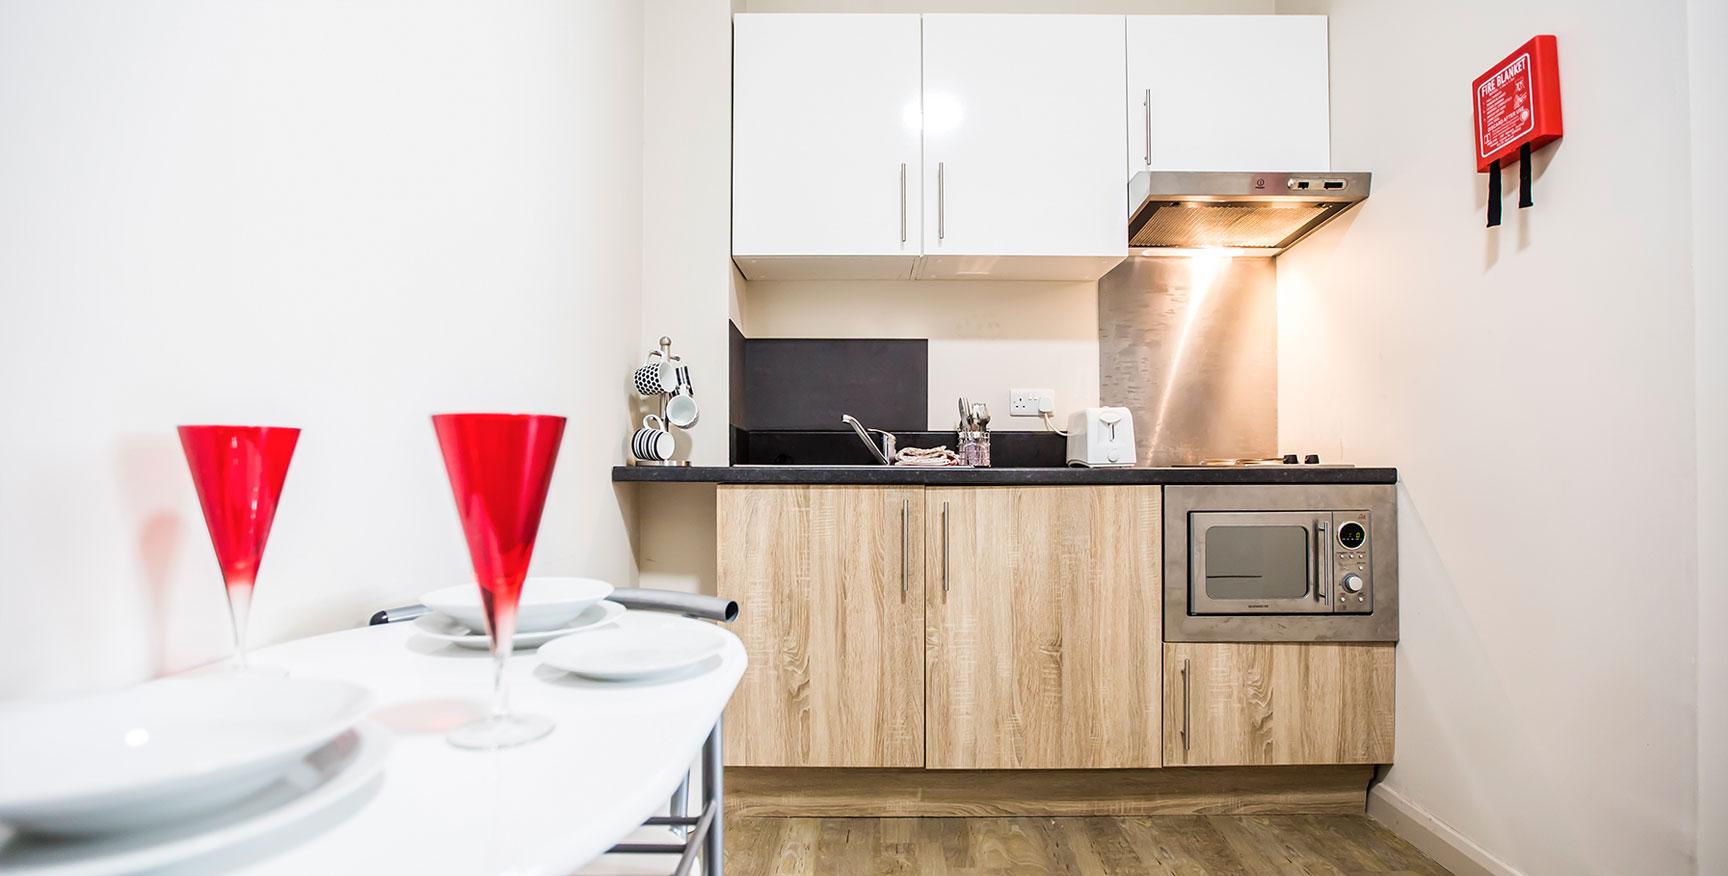 Alexandra House - Luxury Student Accommodation Sheffield (a typical kitchen)